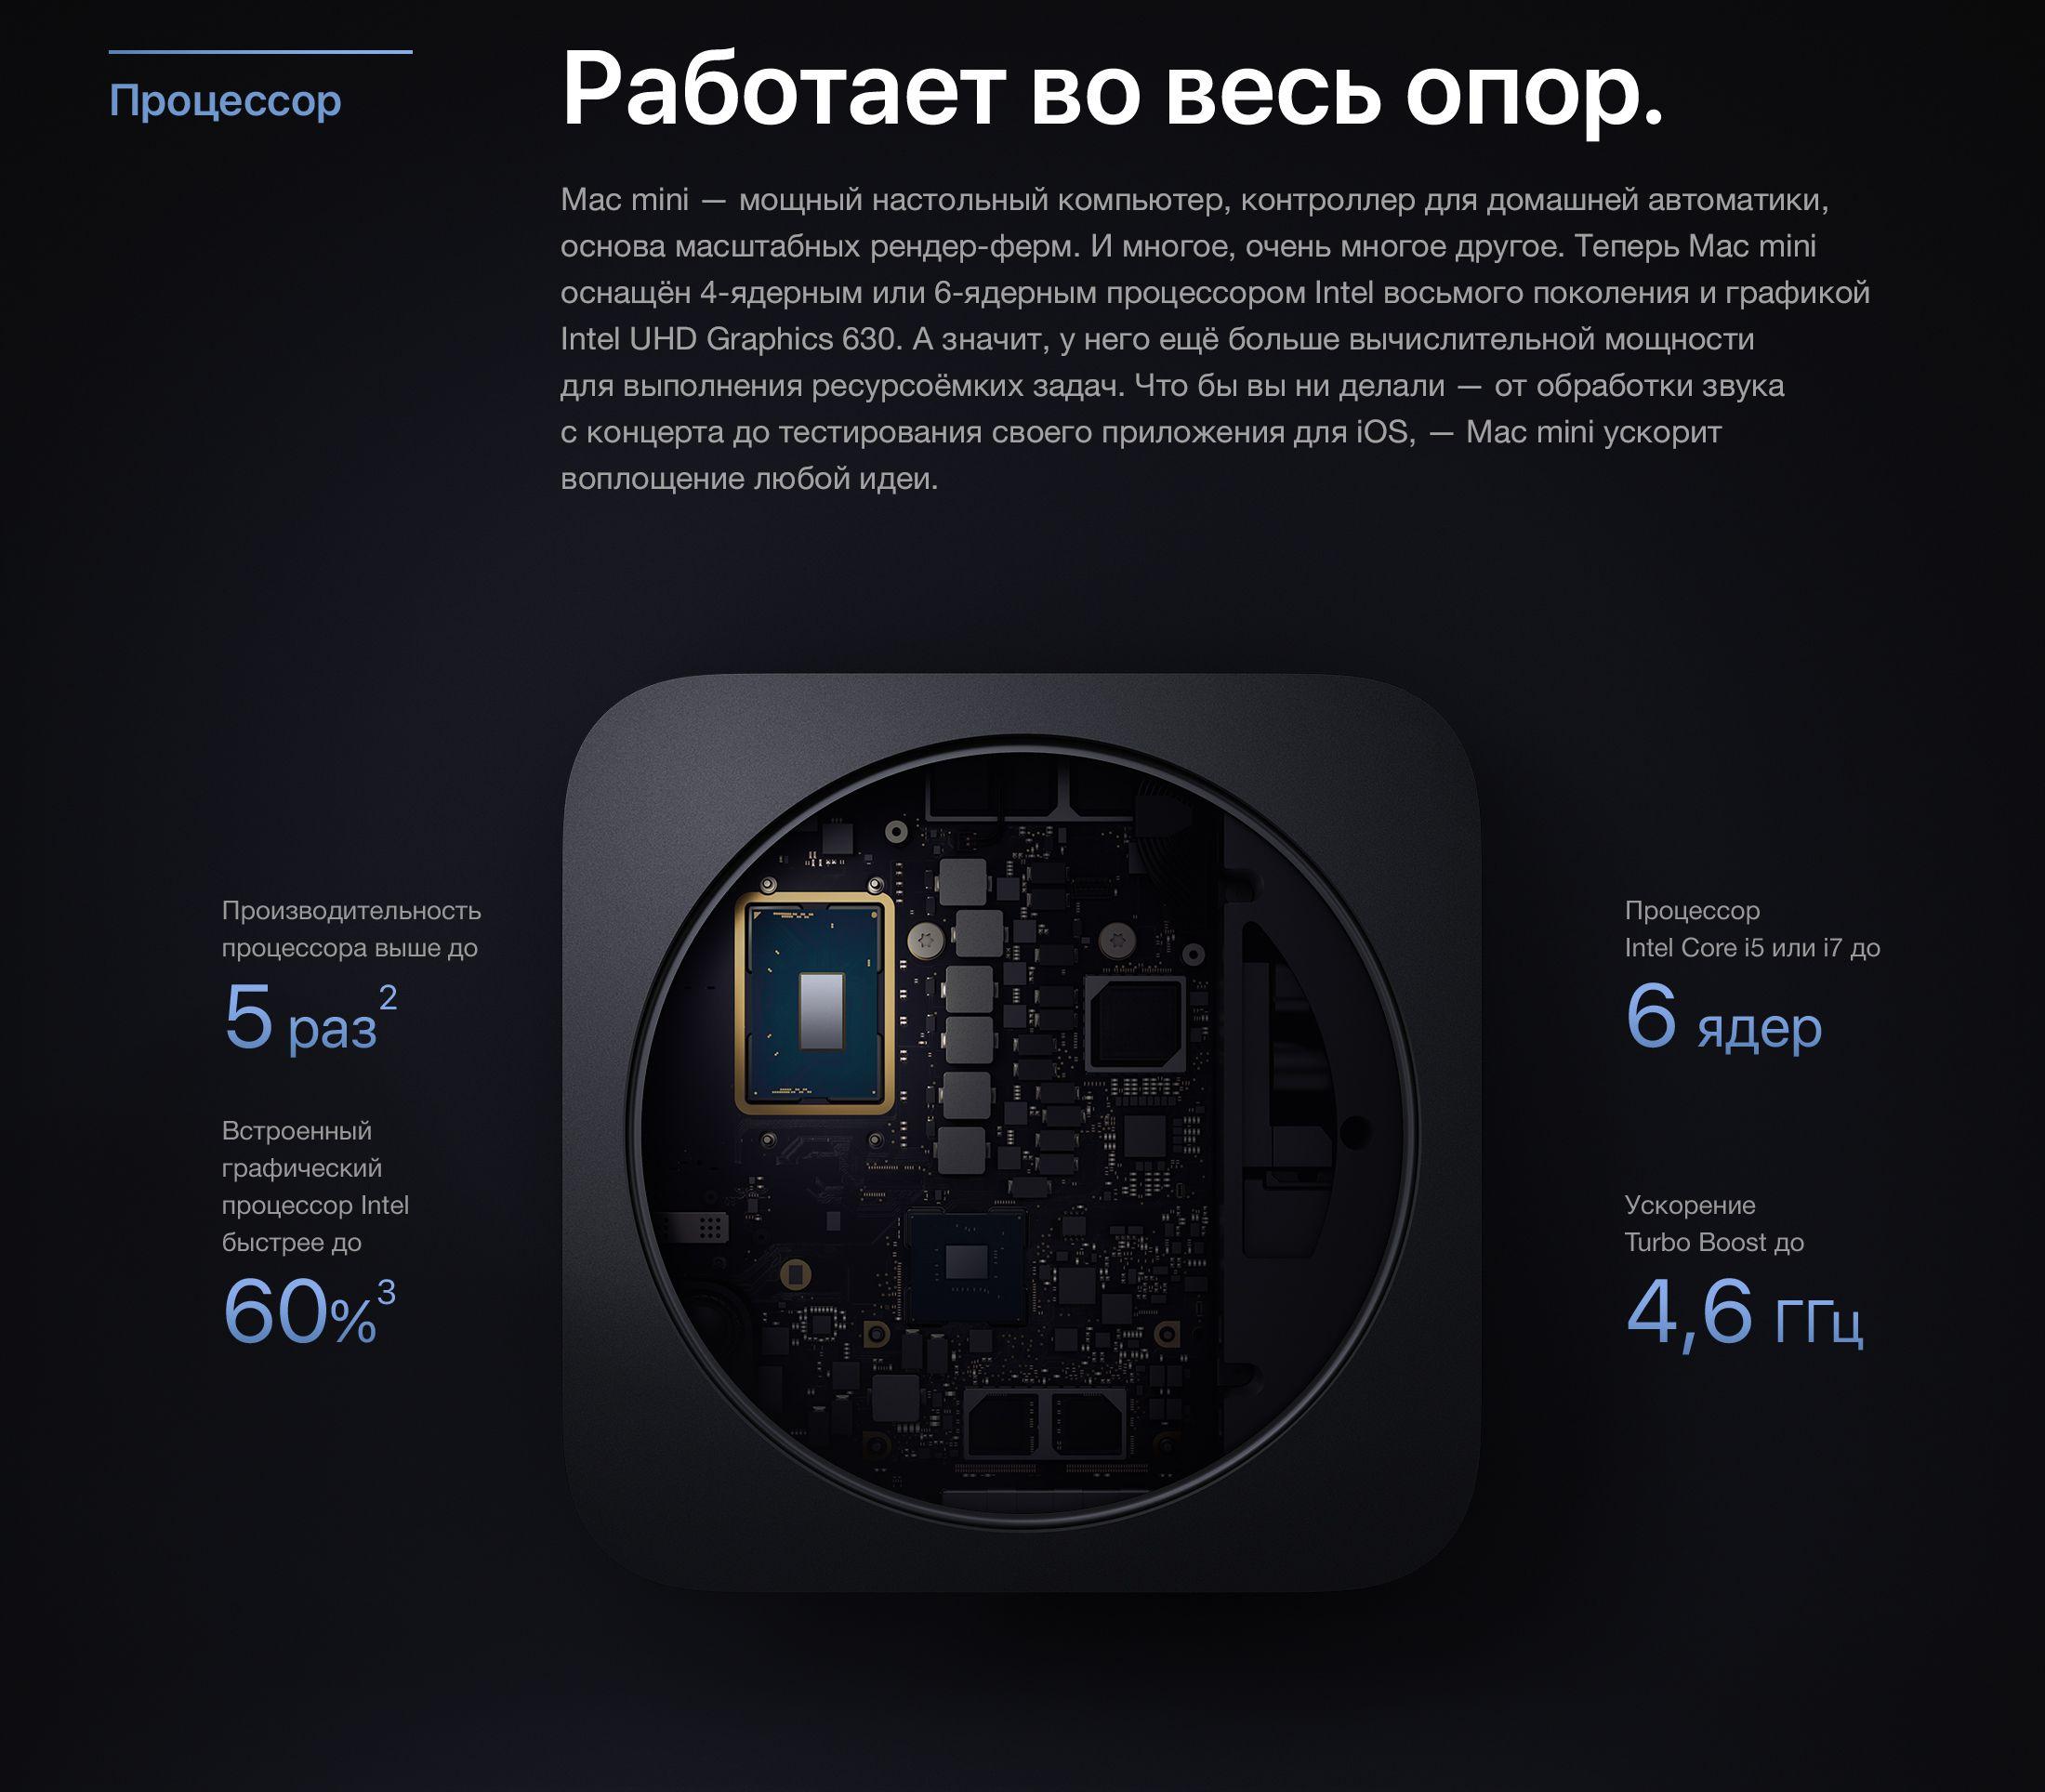 Mac mini характеристики